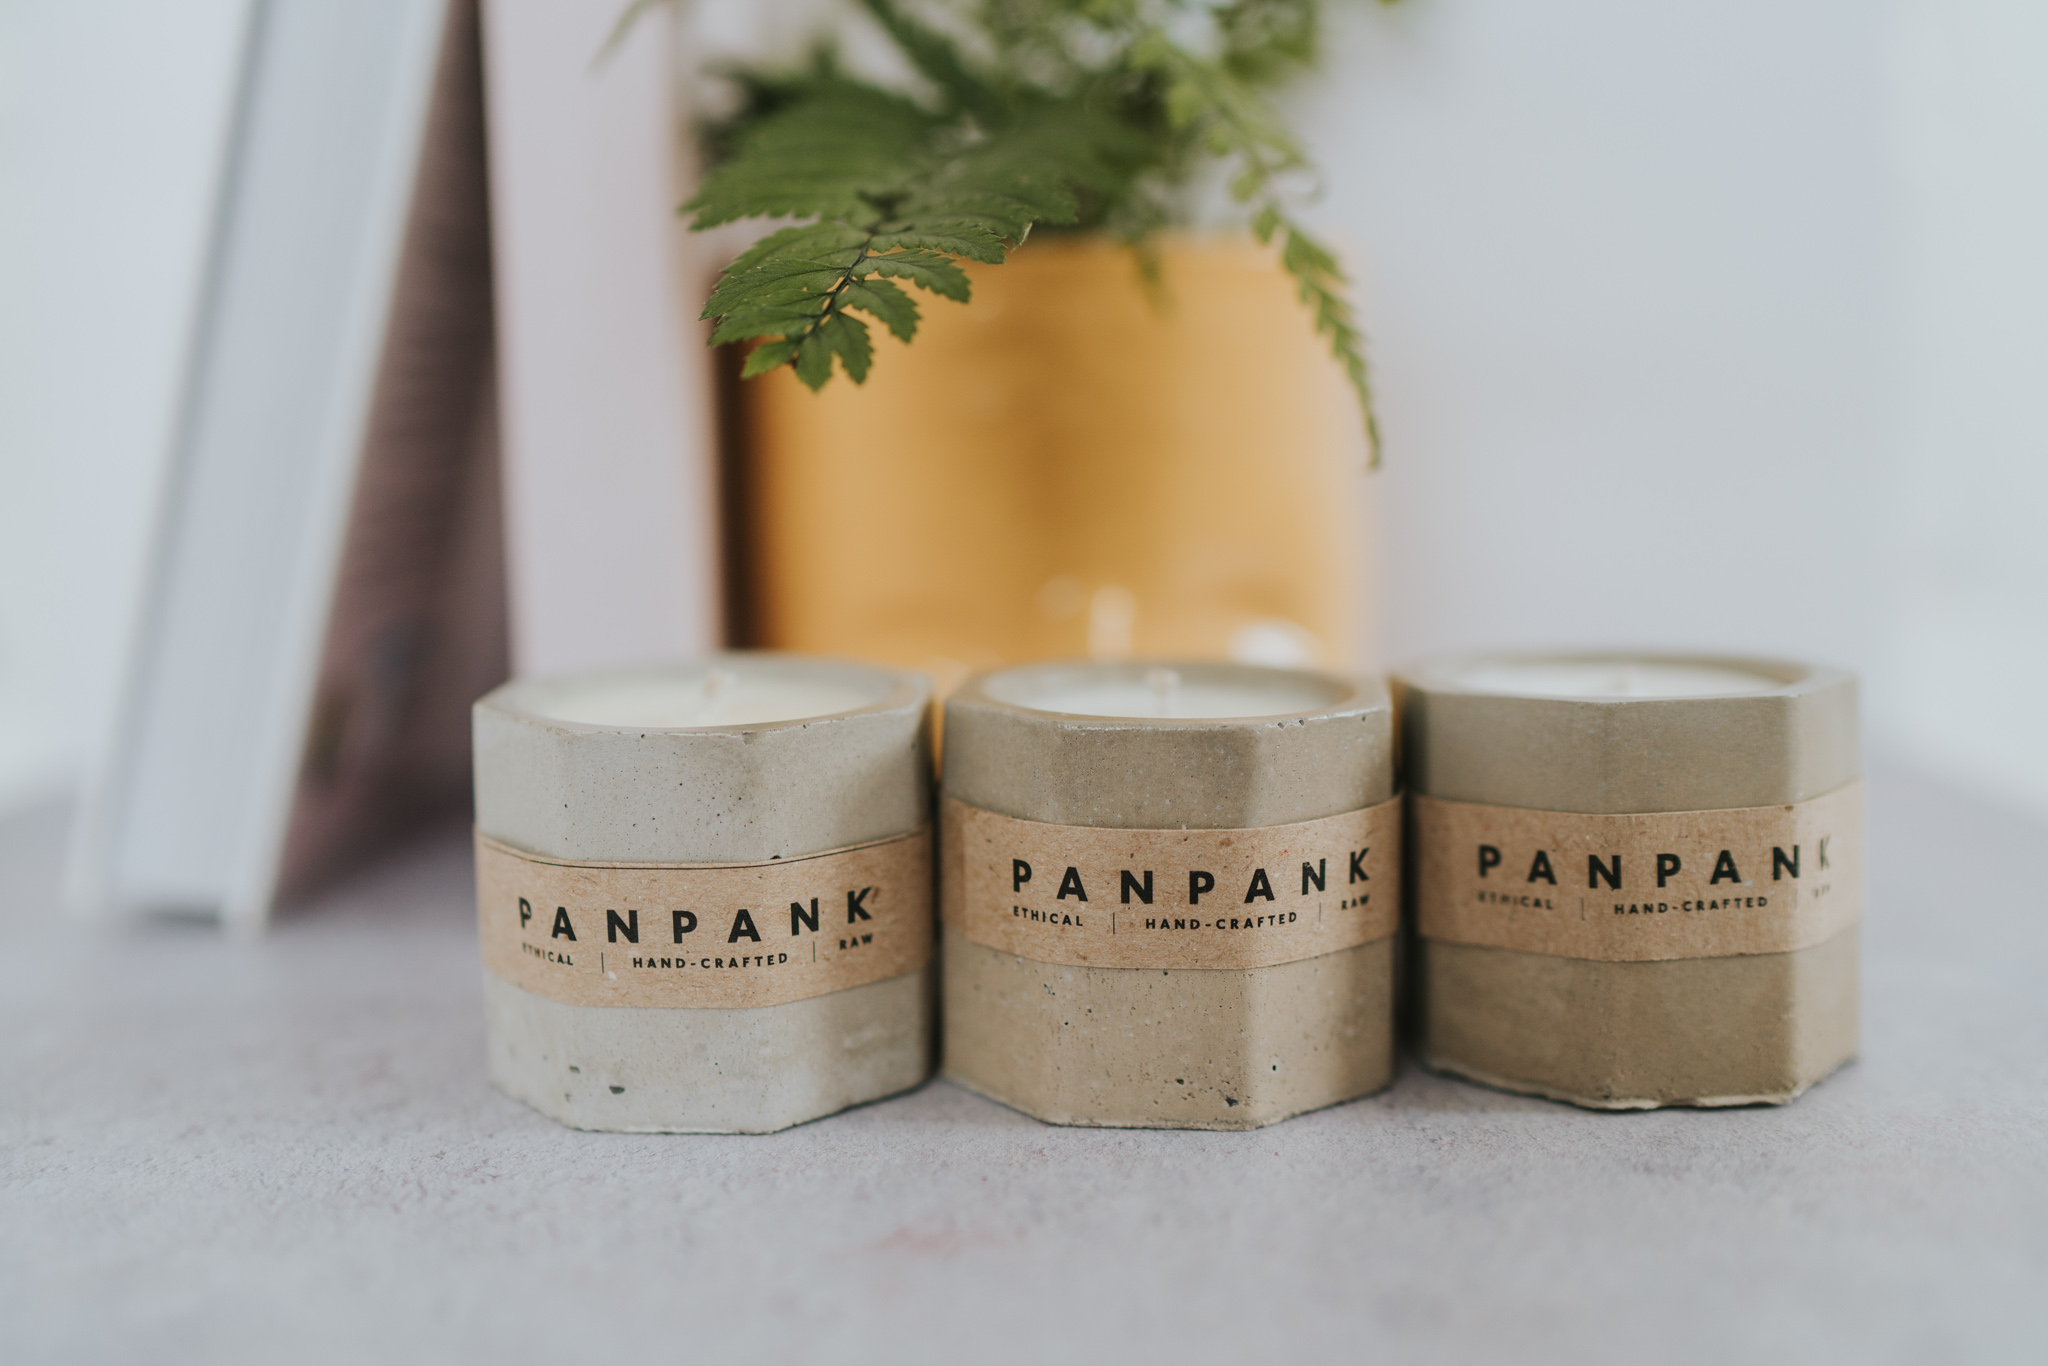 business-branding-panpank-candles-grace-elizabeth-colchester-essex-devon-suffolk-and-norfolk-alternative-wedding-and-family-photographer (9 of 19).jpg